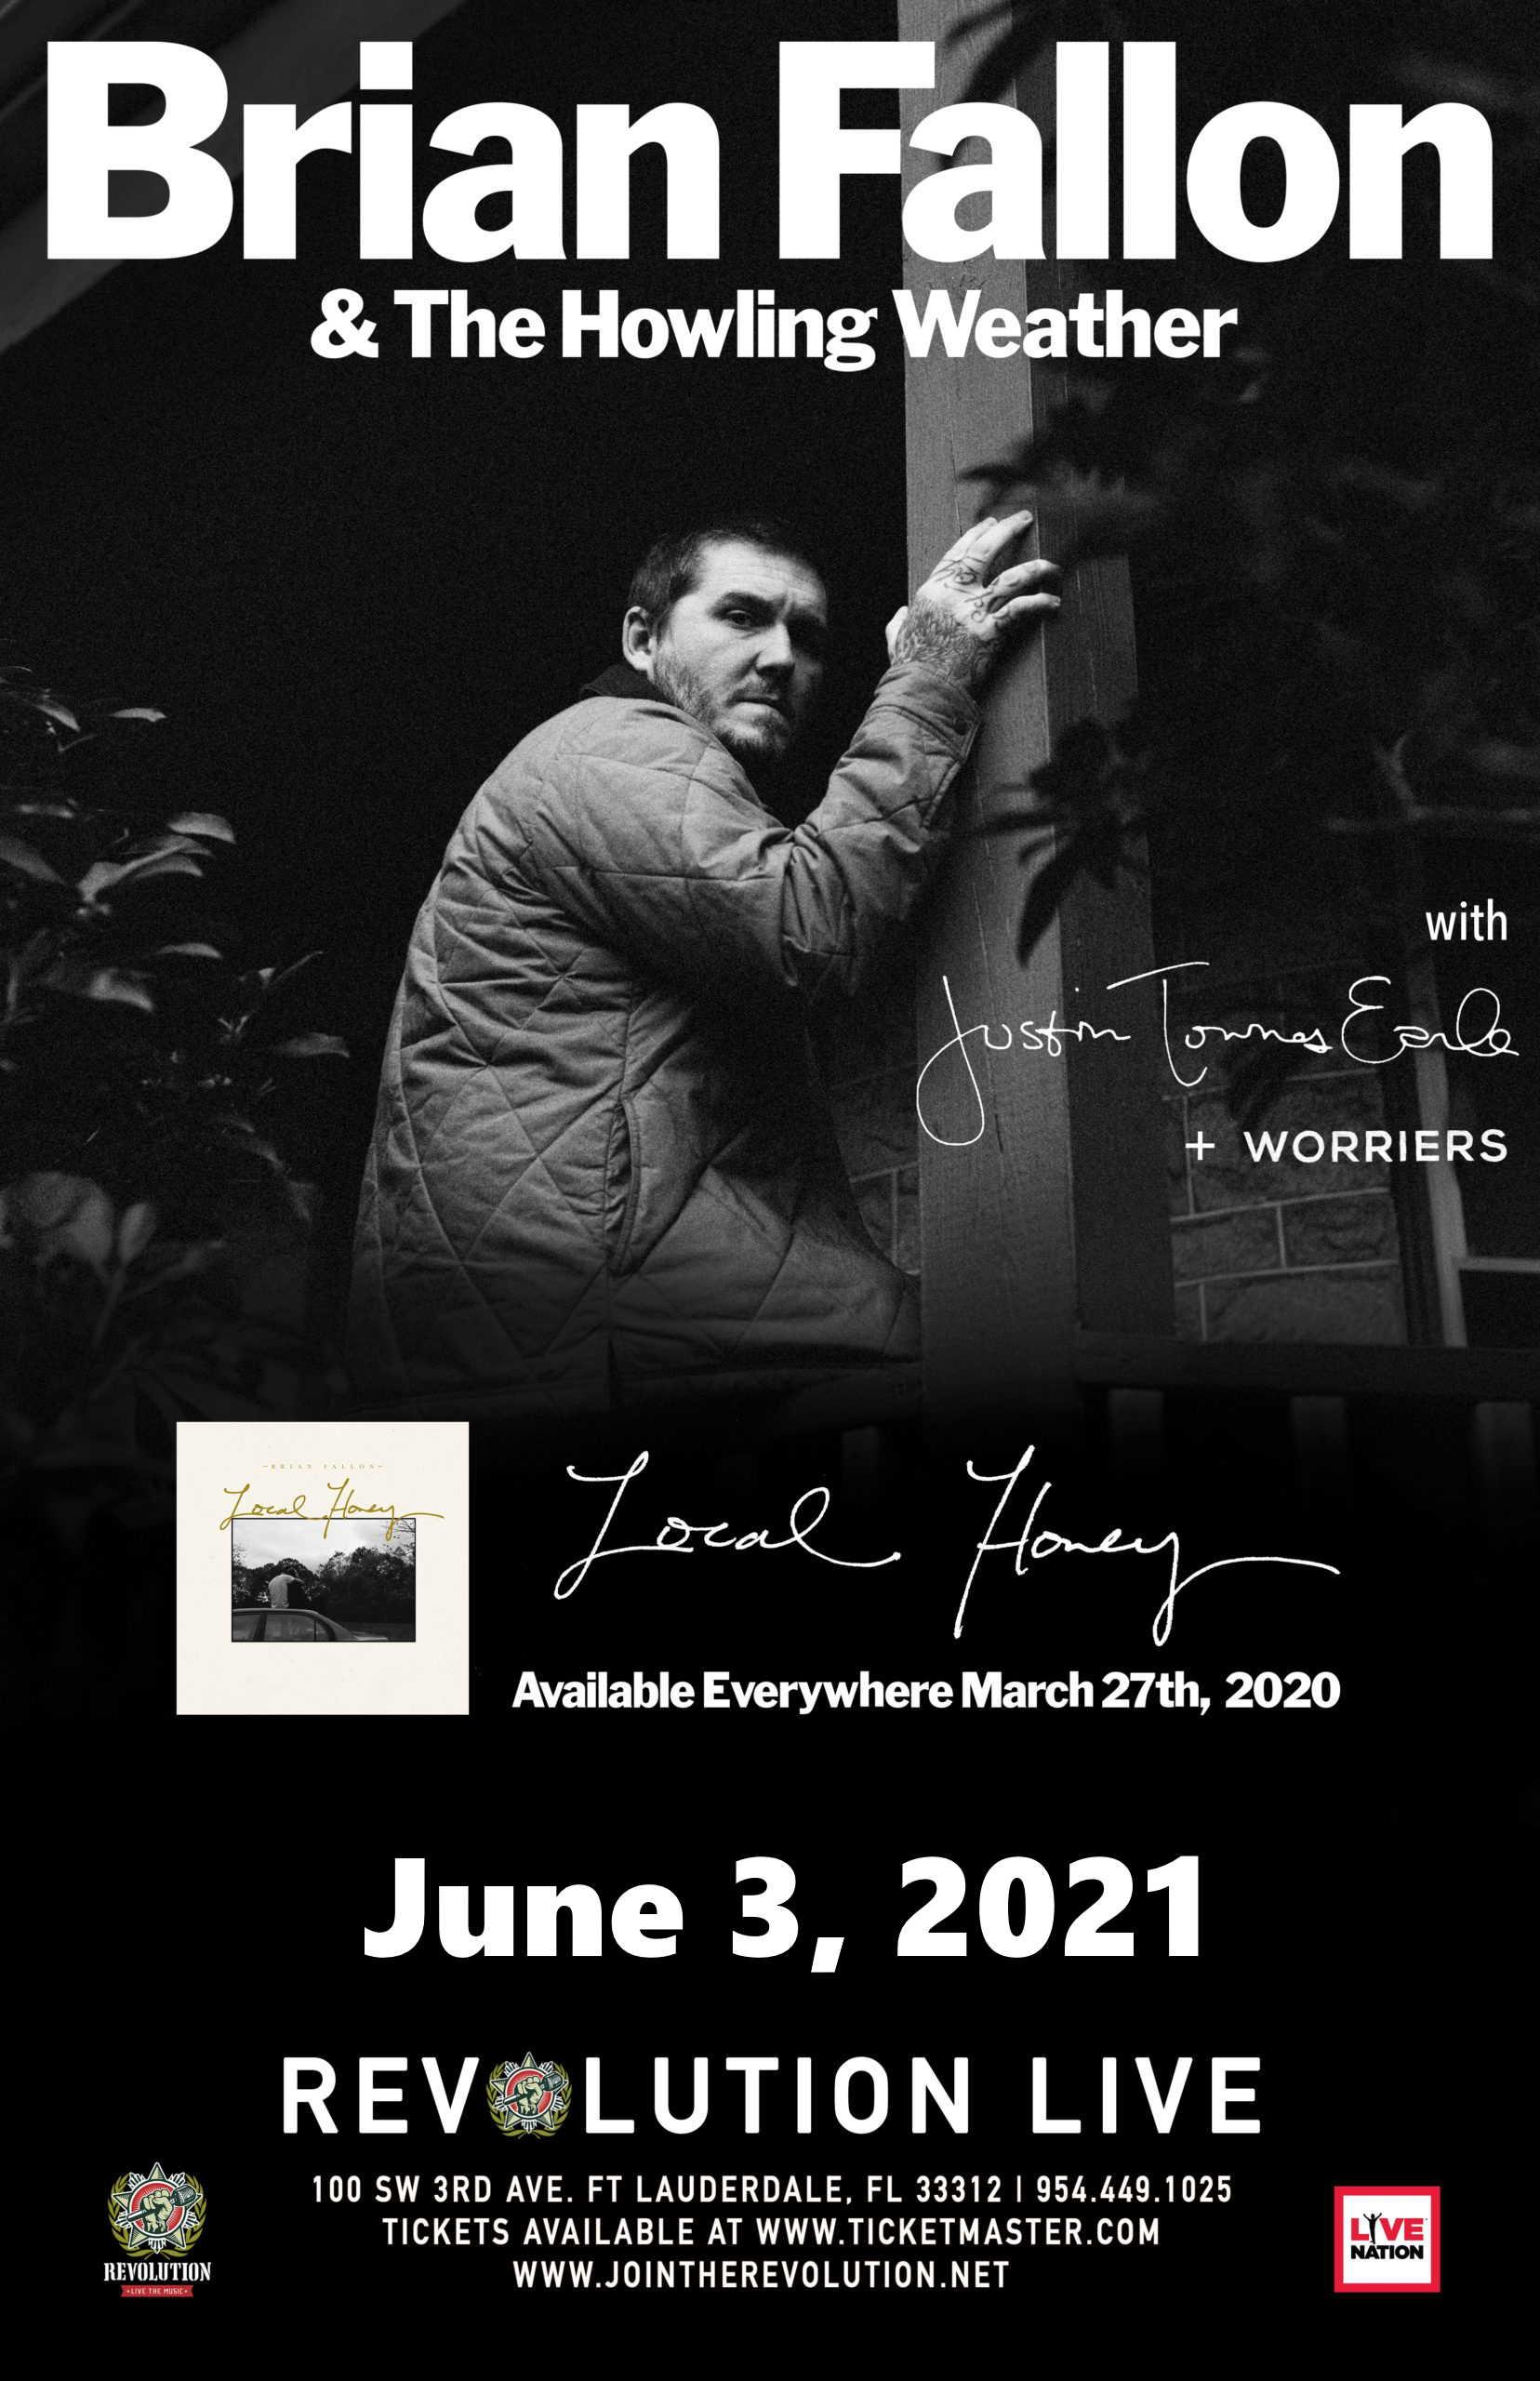 Brian Fallon poster